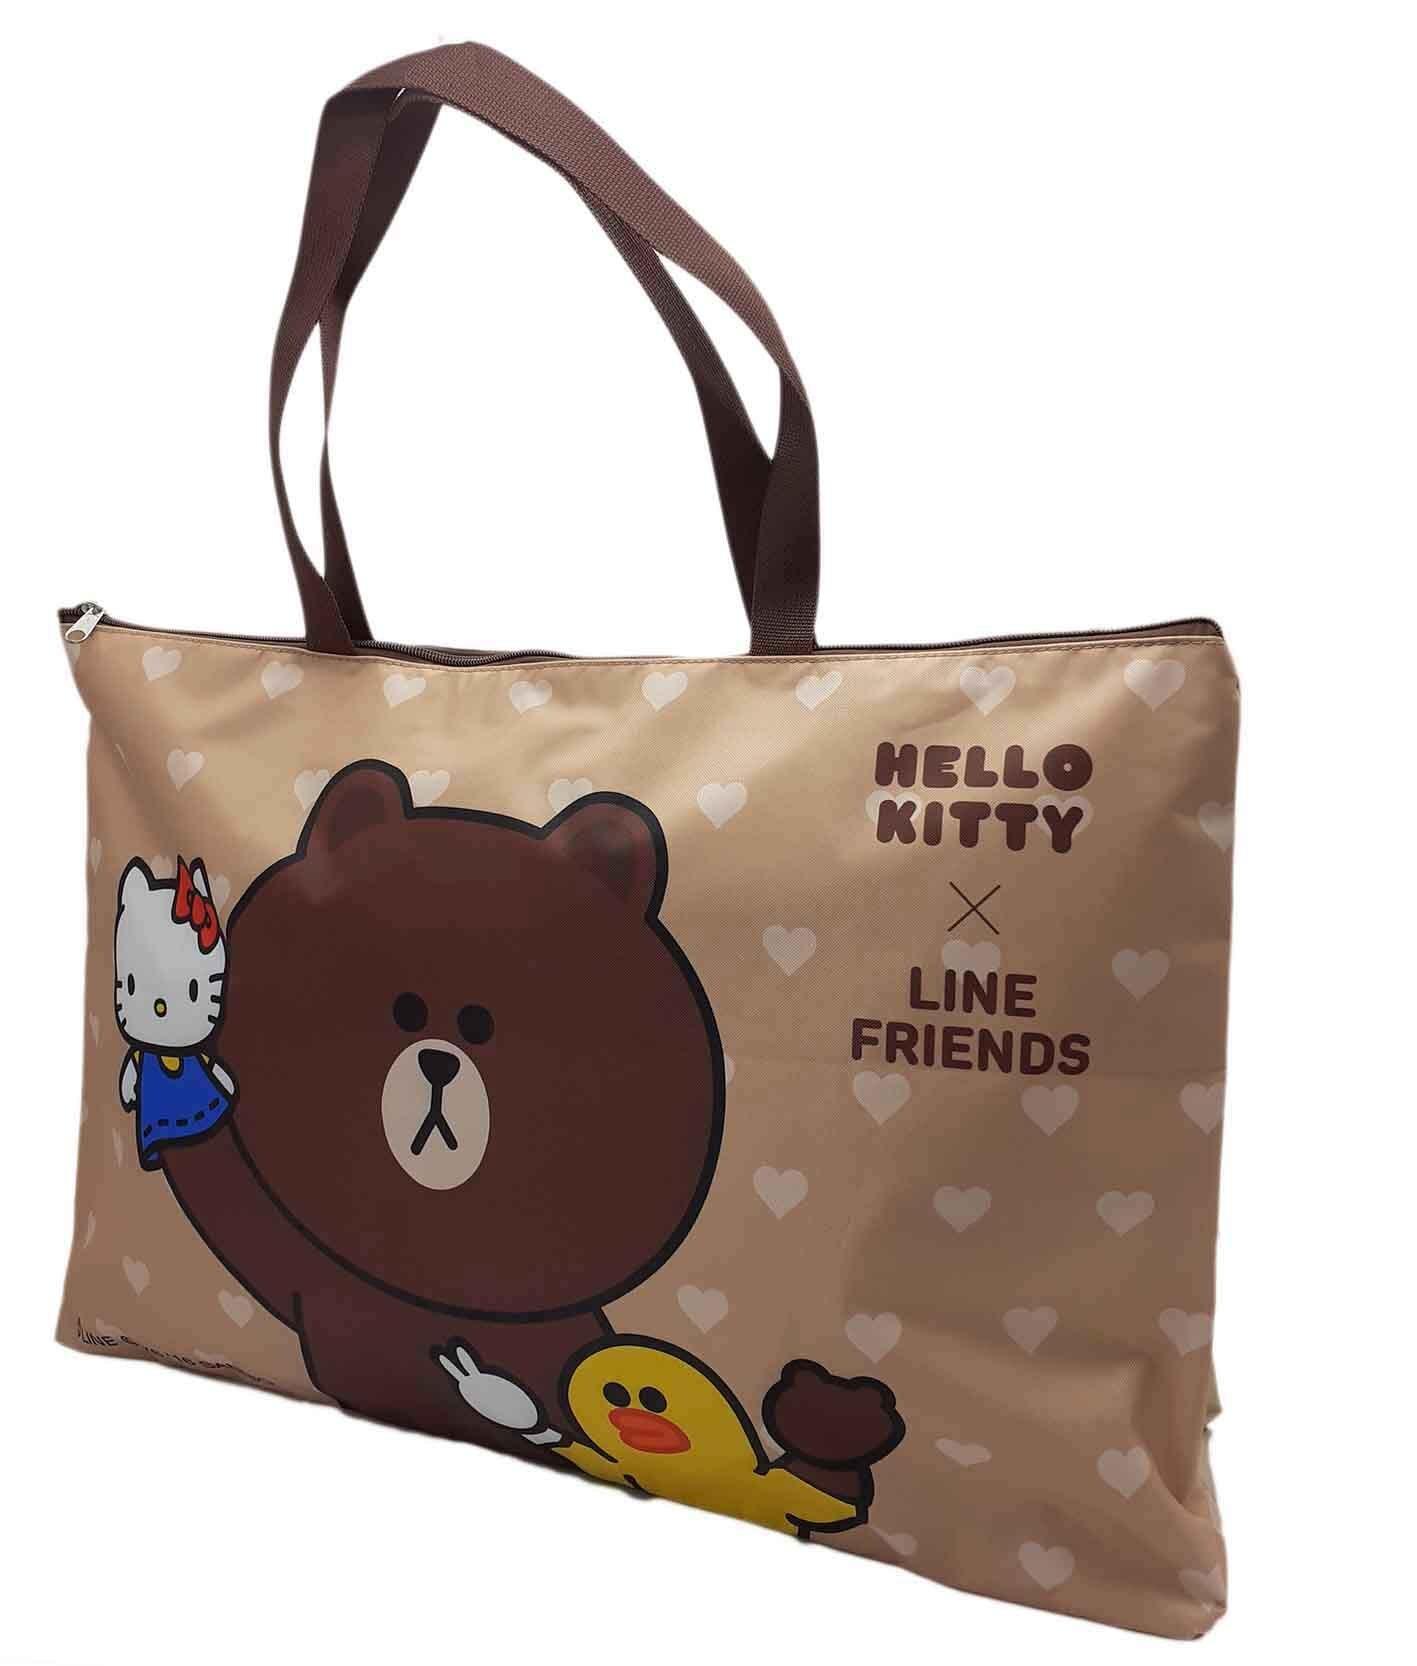 Hello kitty x Line毛毯收納袋(咖啡)